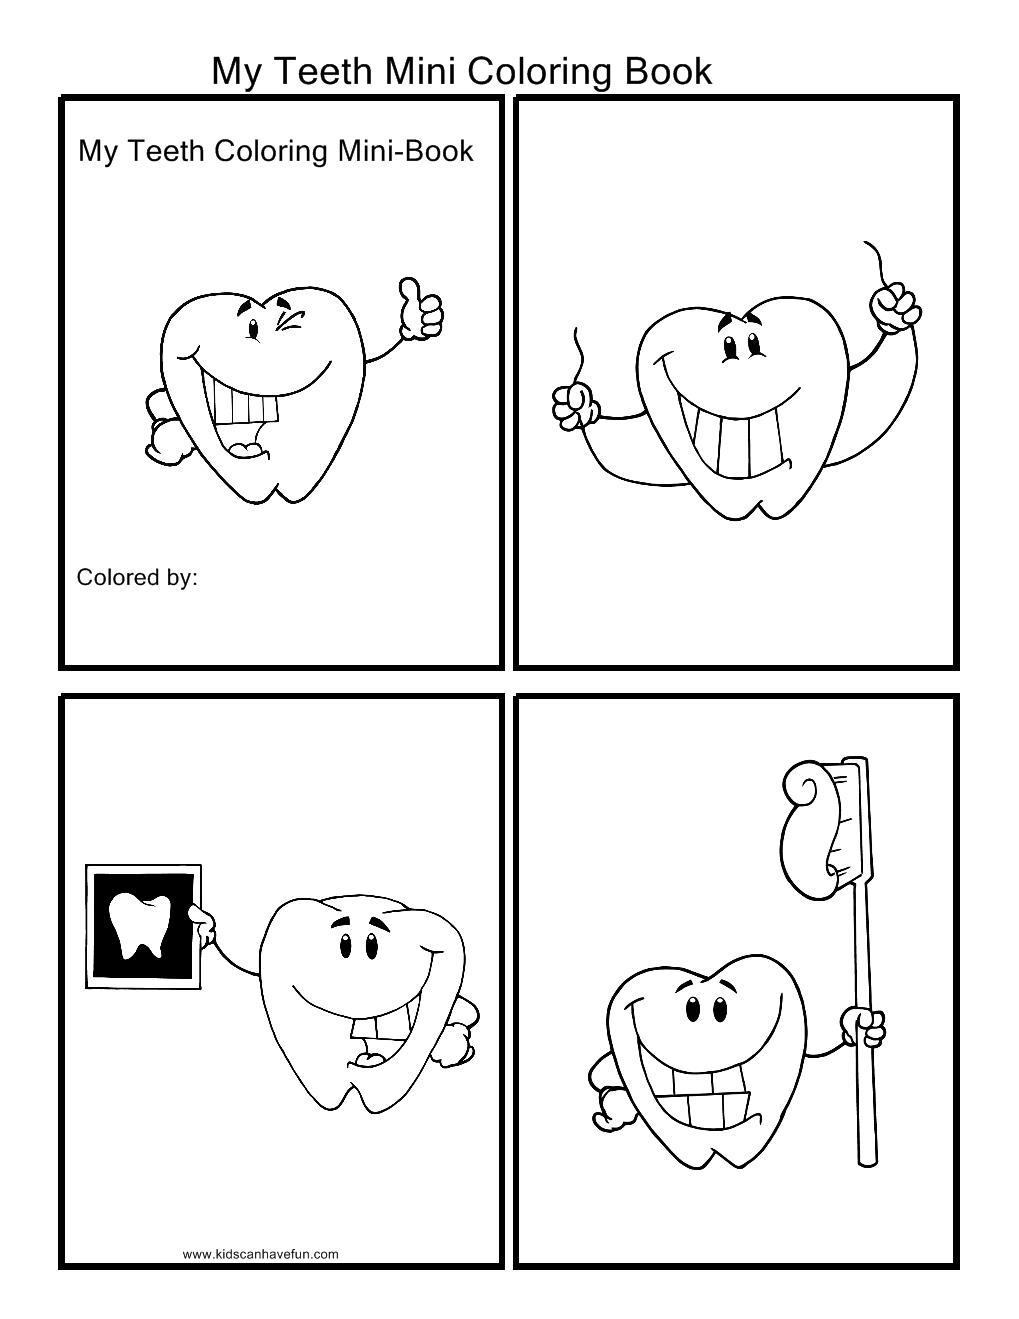 My Teeth Coloring Book About Me Activities Preschool Projects Preschool Books [ 1319 x 1019 Pixel ]